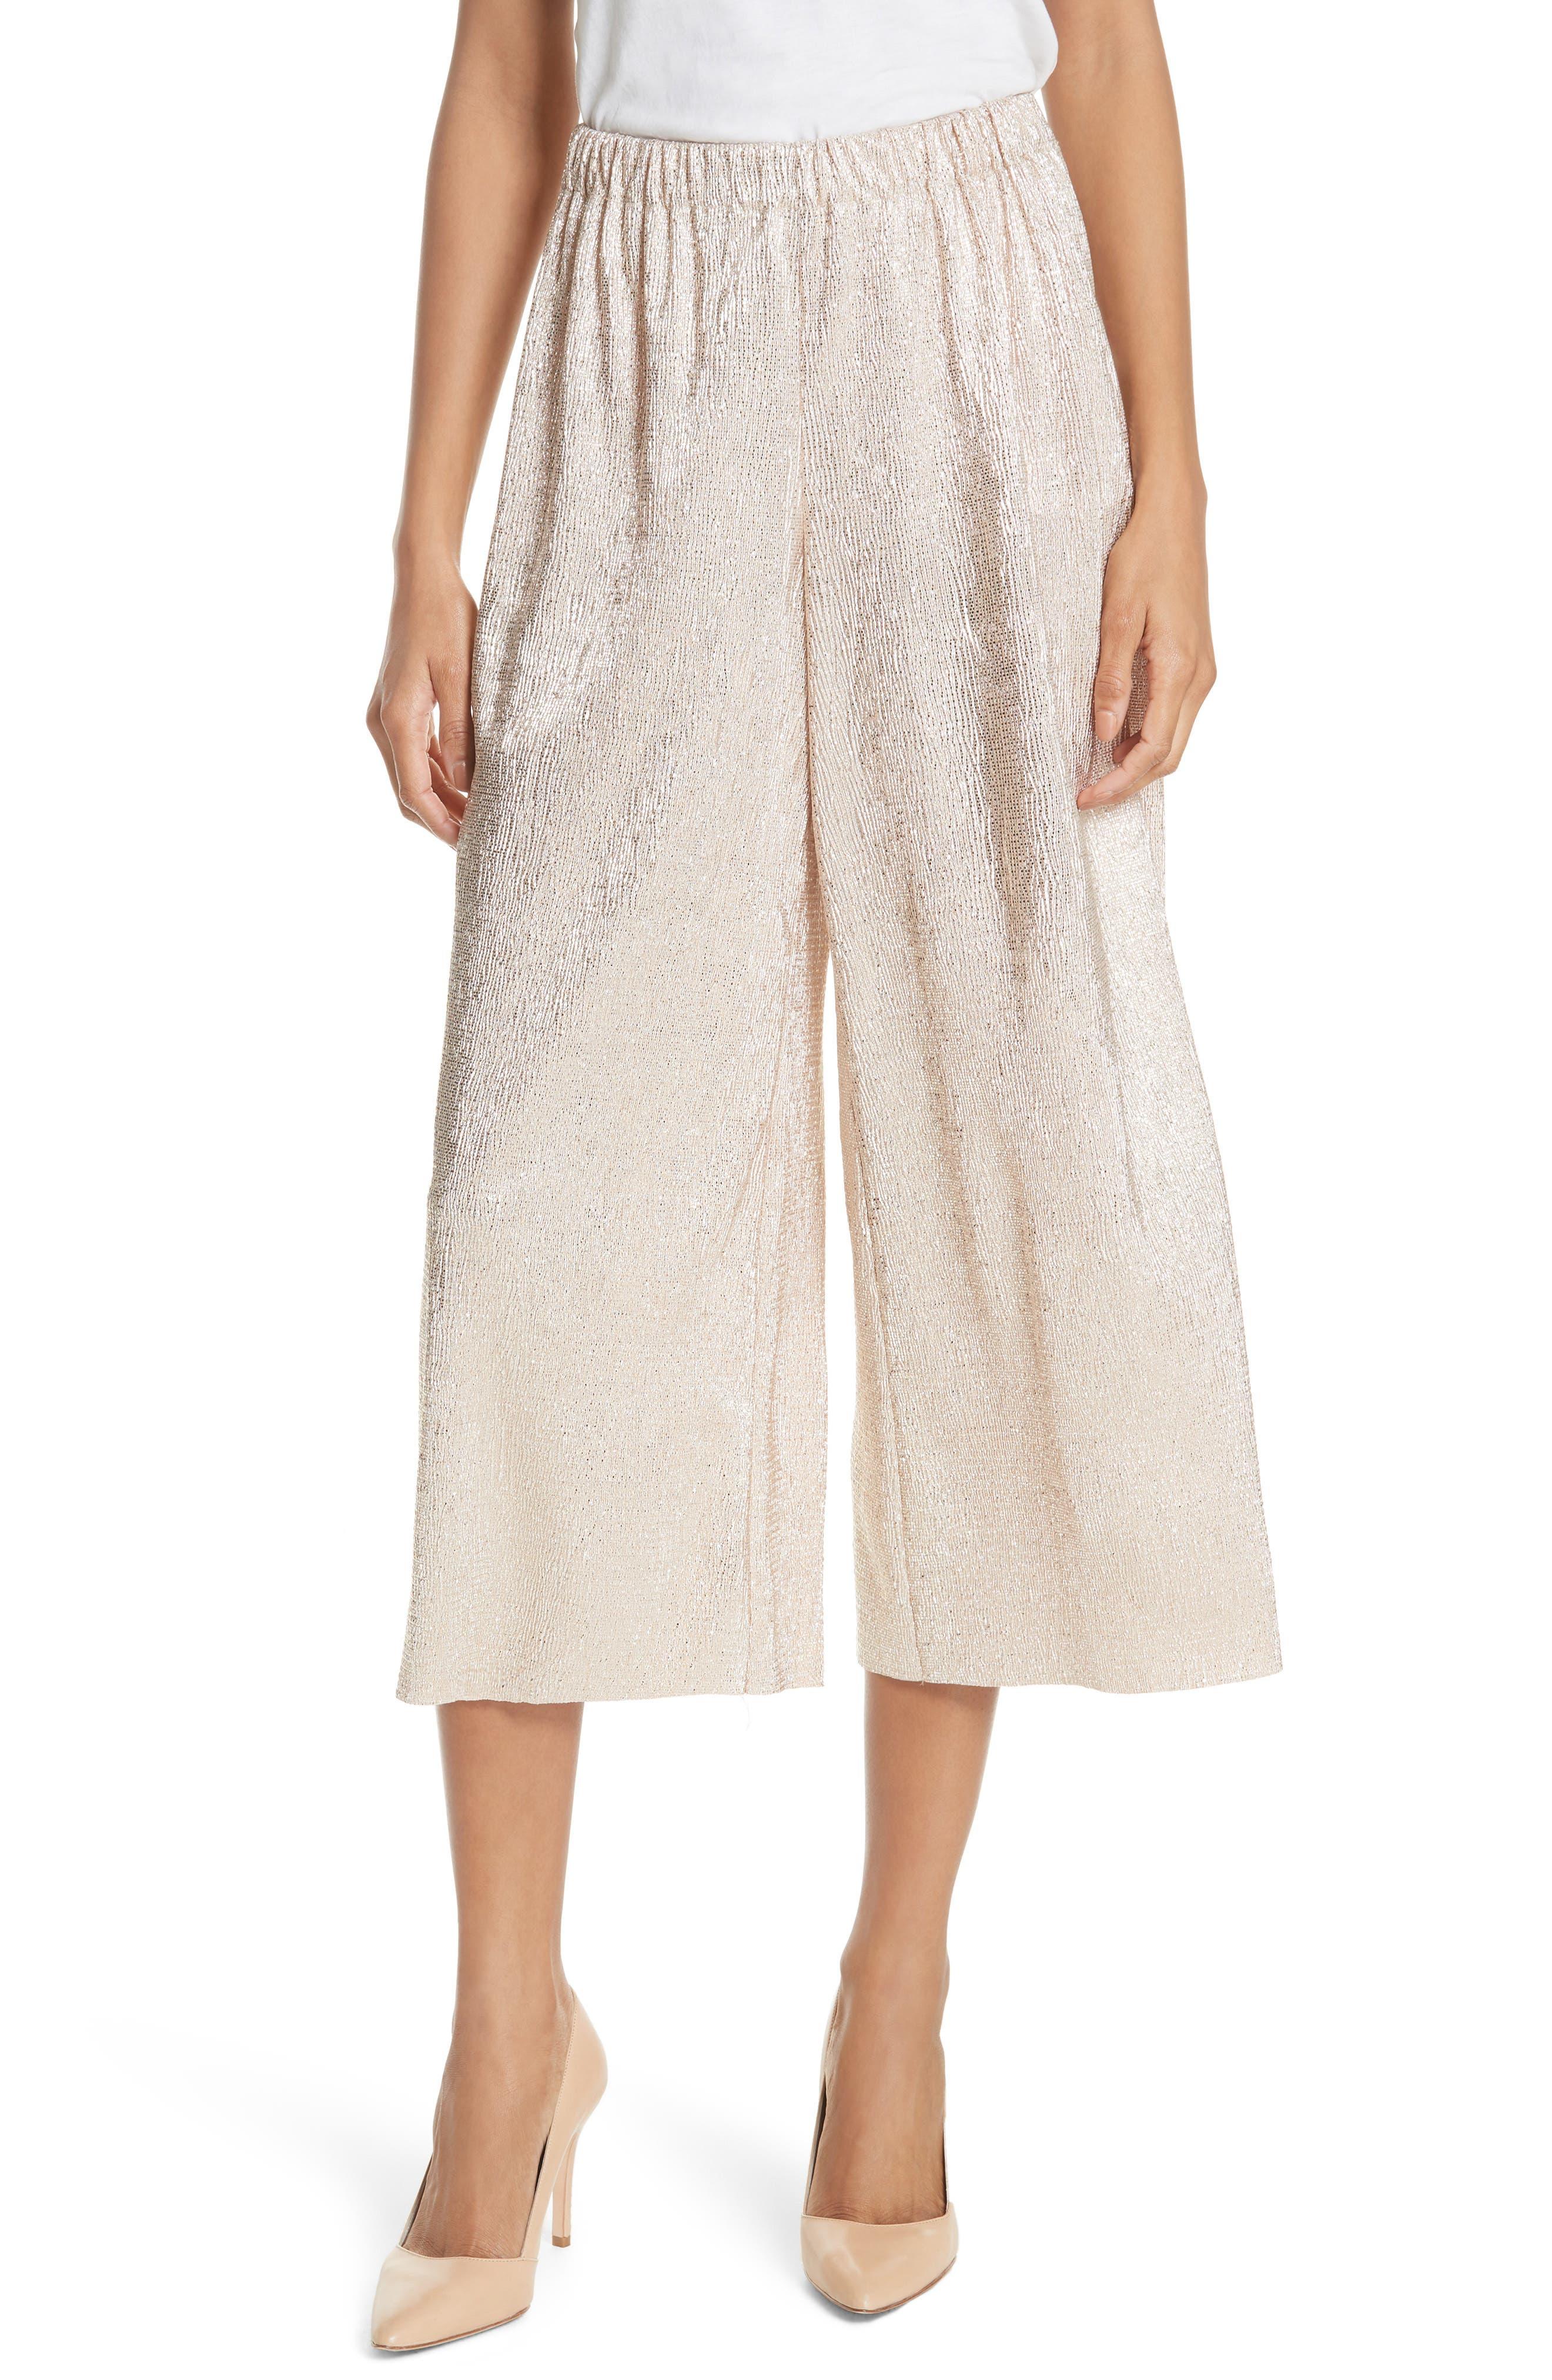 Elba Textured Crepe Wide Leg Pants,                         Main,                         color, Blush